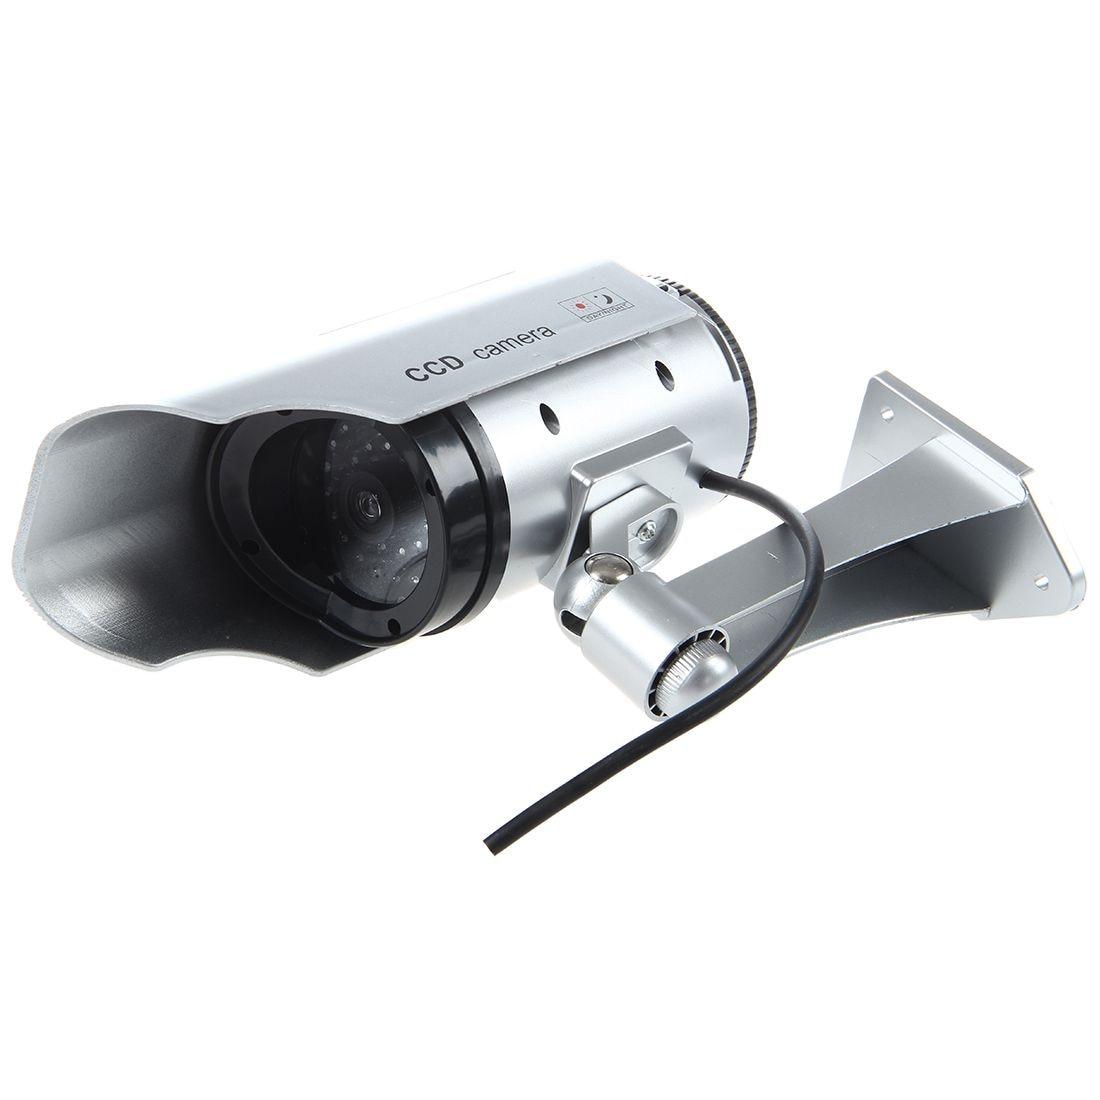 Reasonable Ig-udc 4 Silver Fake Security Camera With 30 Illuminating Leds silver Fragrant Aroma